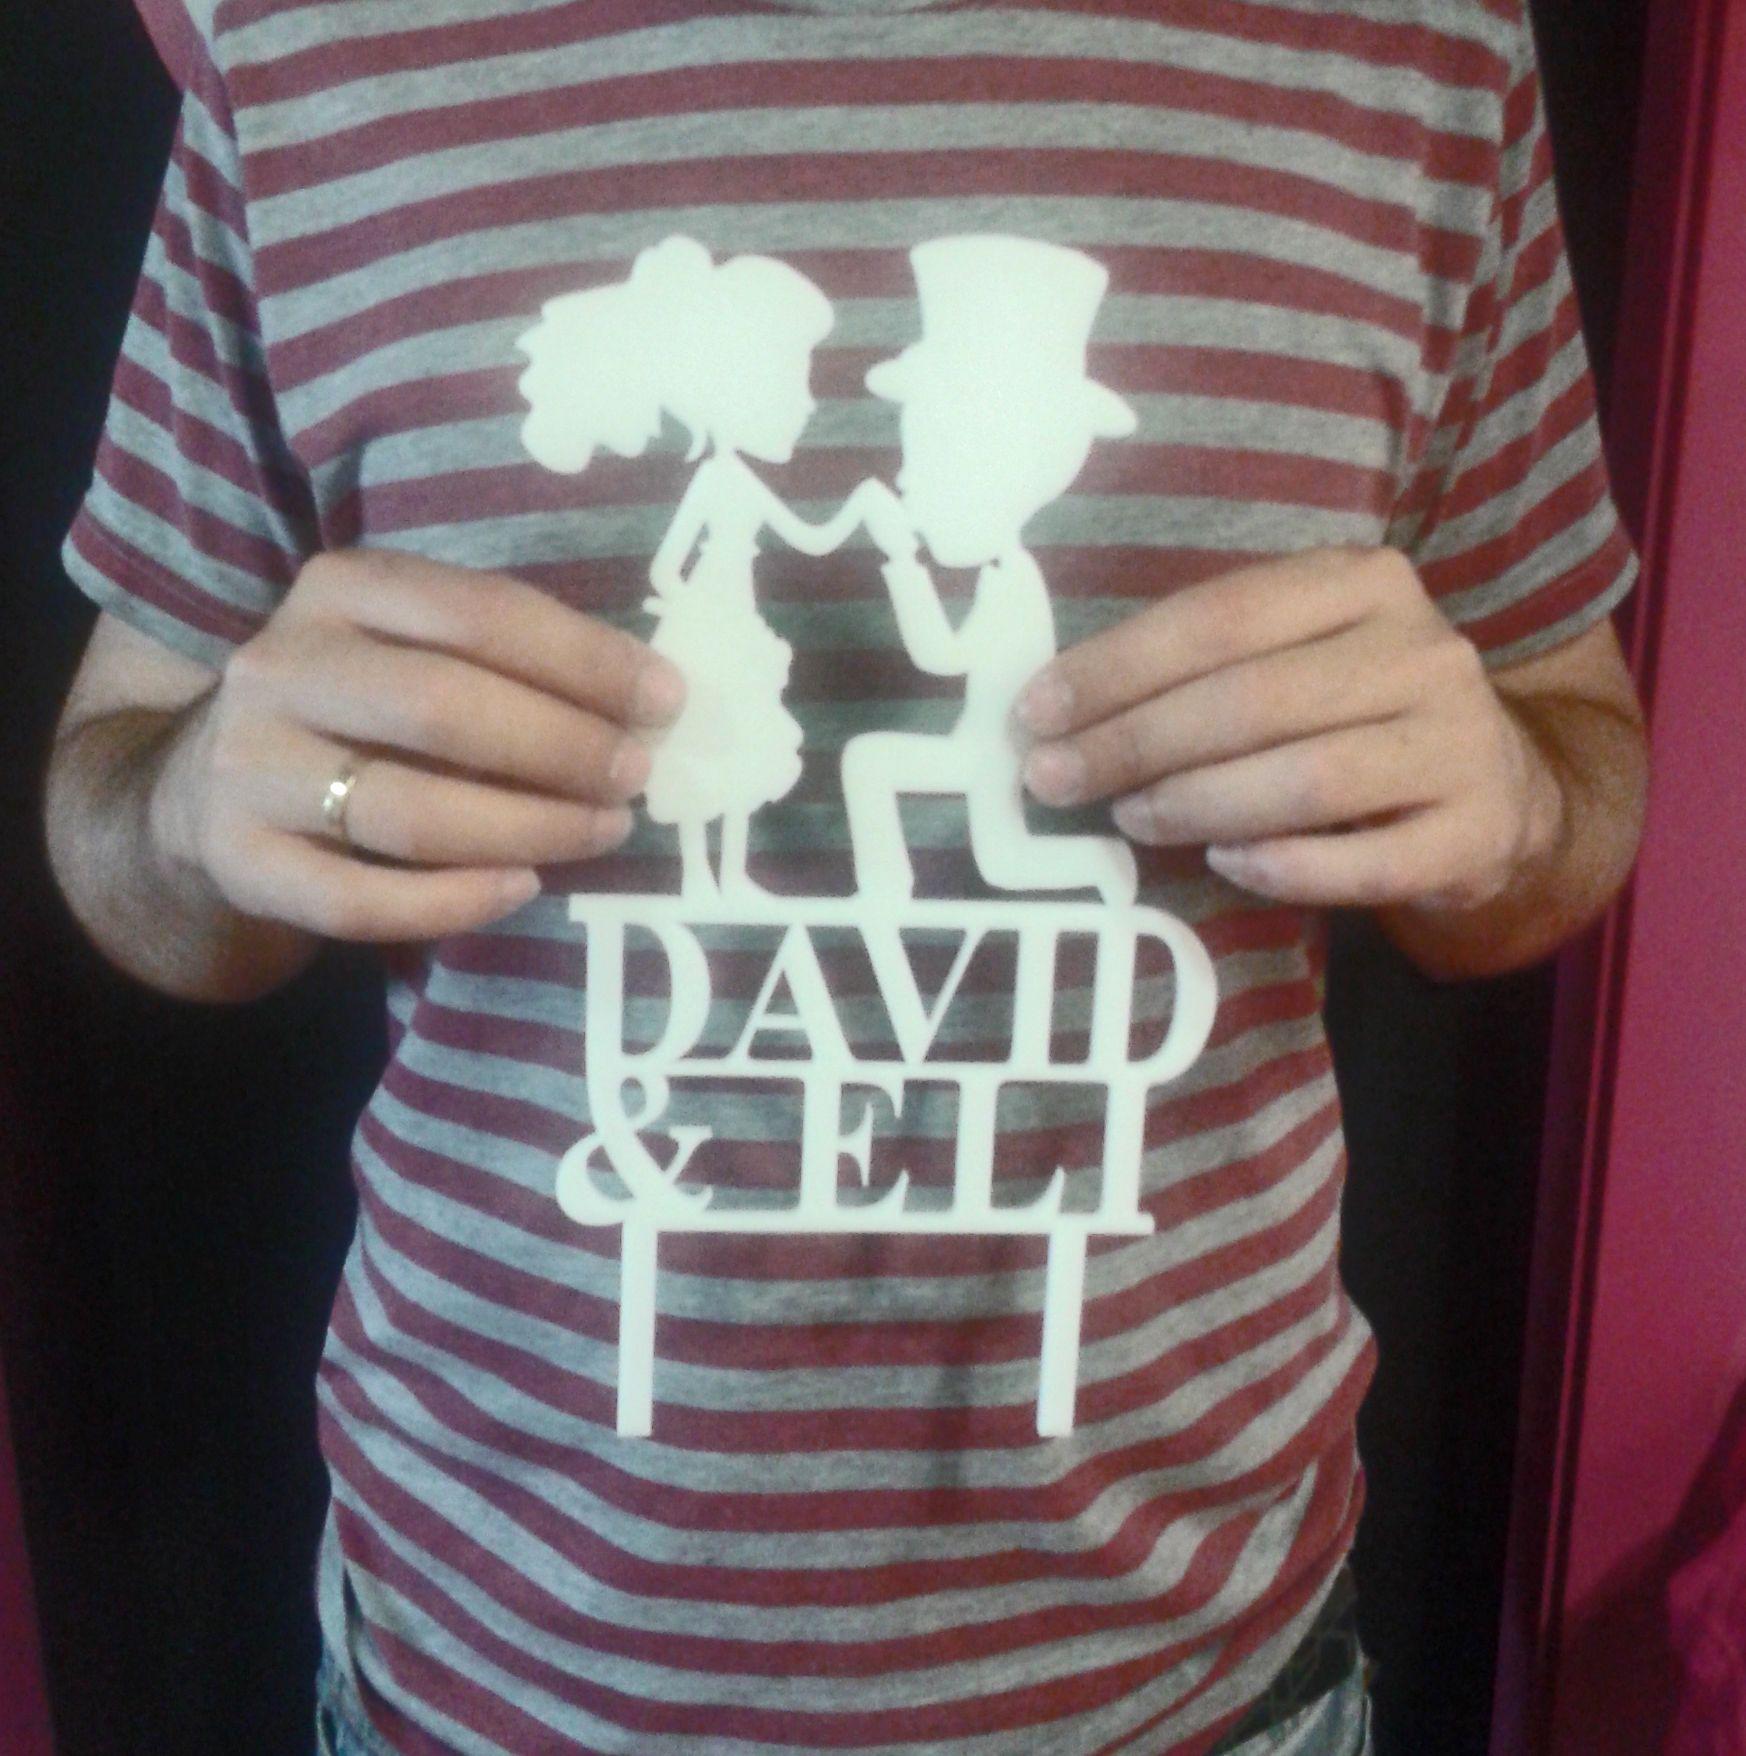 figura de madera metacrilato blanco #figuradecorativatarta #bodapersonalizada #escarabat